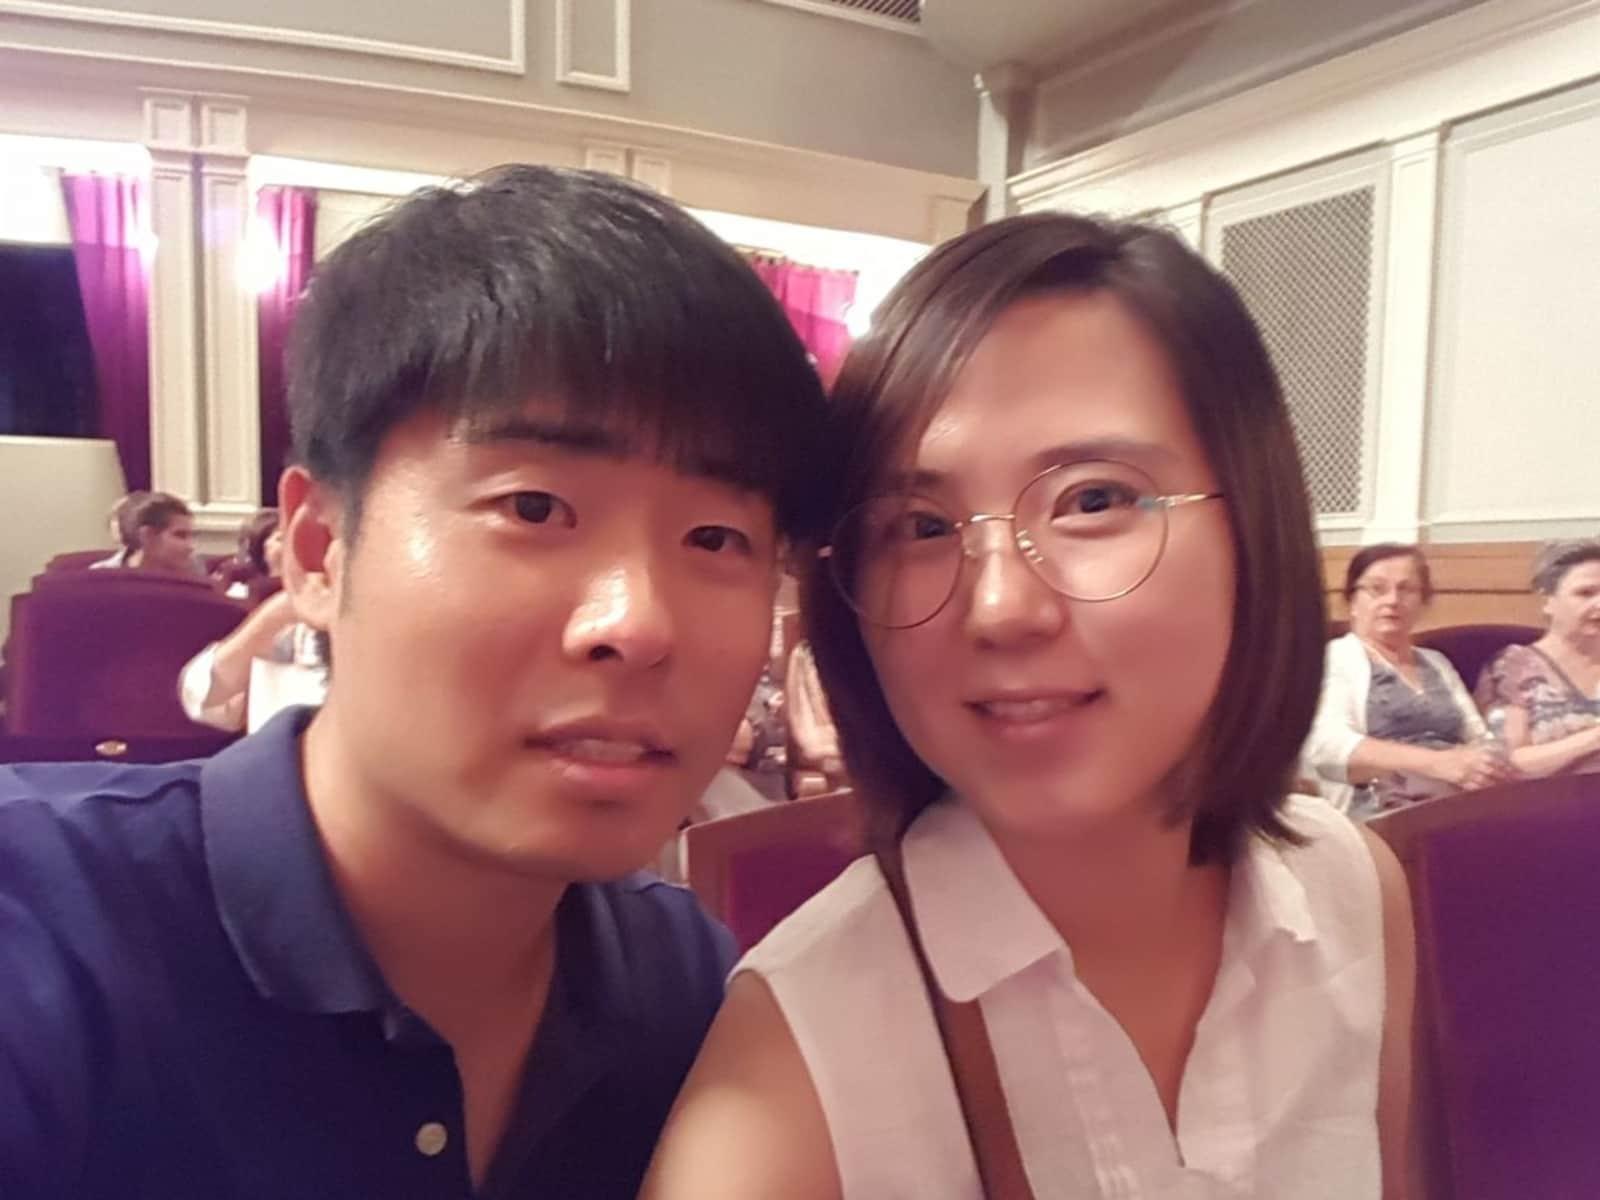 Narae & Chanil from Seoul, South Korea